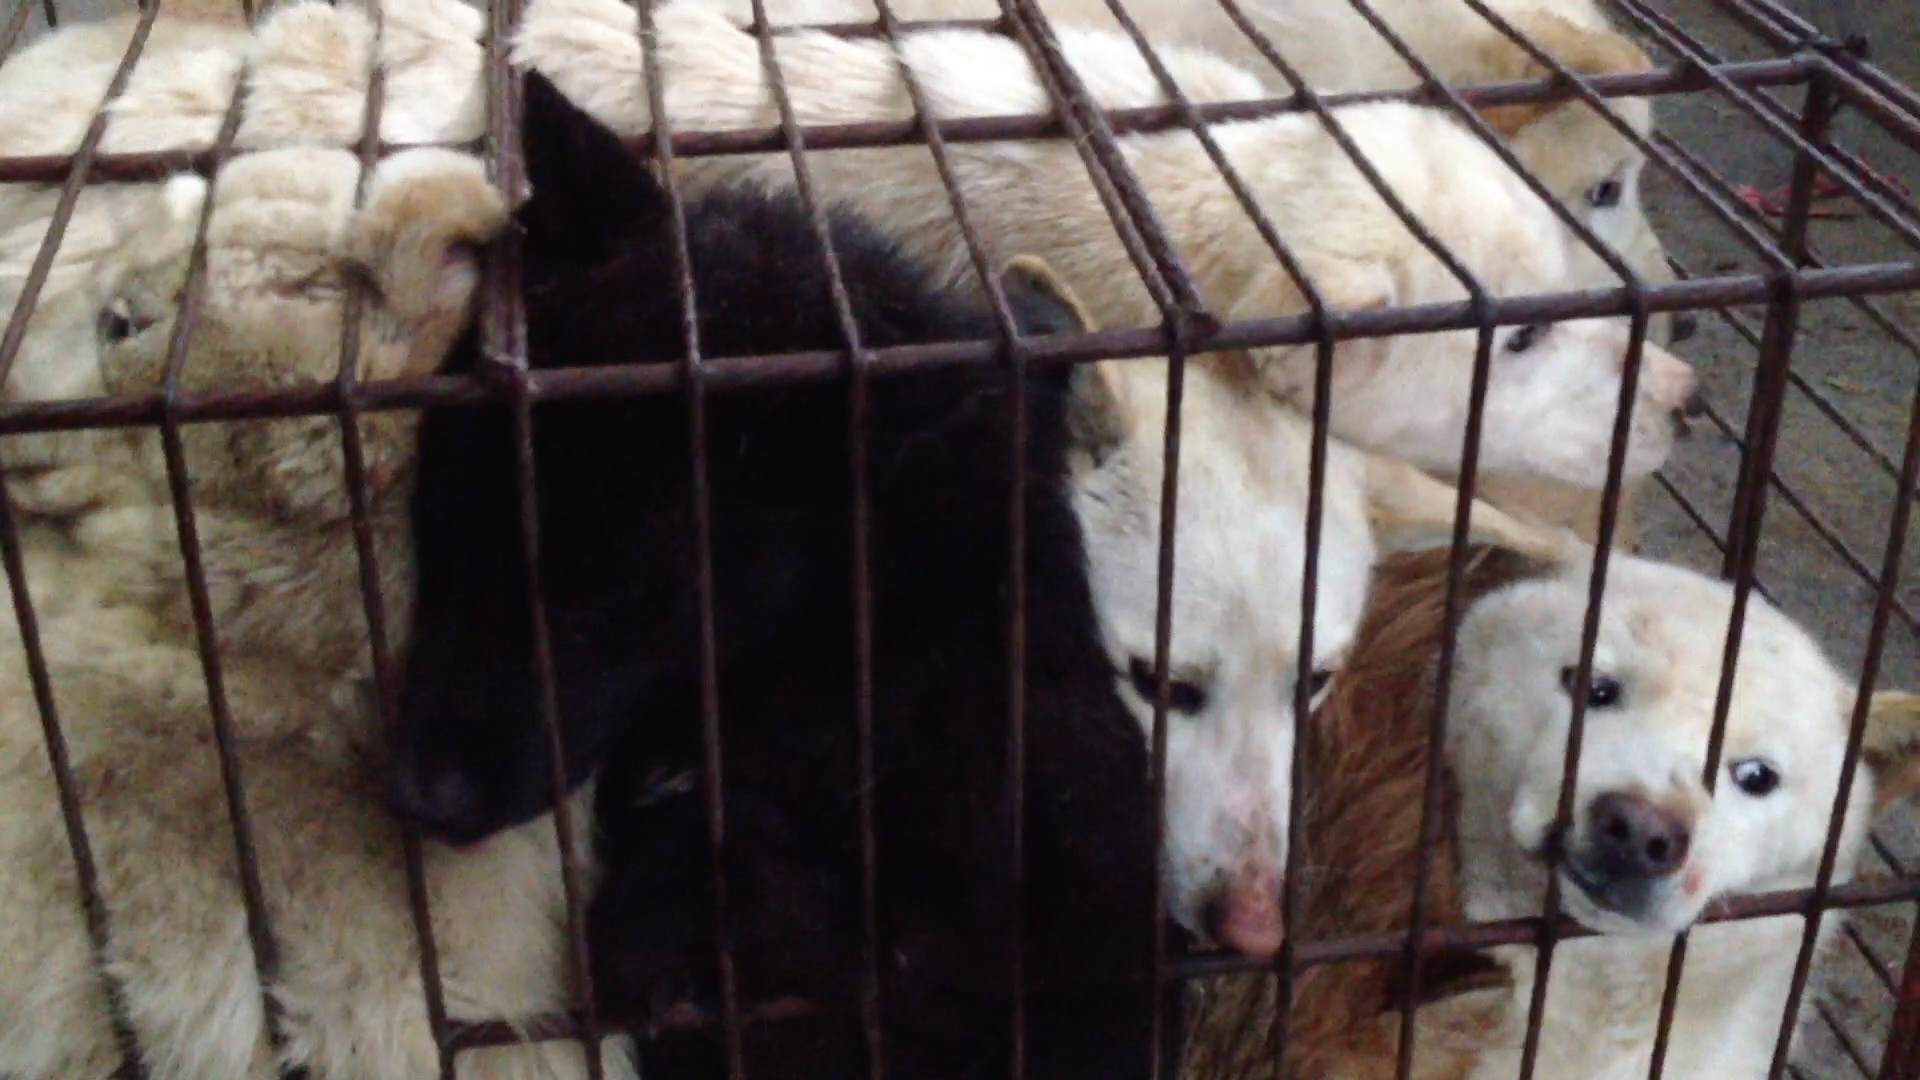 http://koreandogs.org/dmp/?utm_source=sendinblue&utm_campaign=Calls_to_Action__Busan_KAPCA_shuts_down_dog_farm_and_rescue_puppies&utm_medium=email